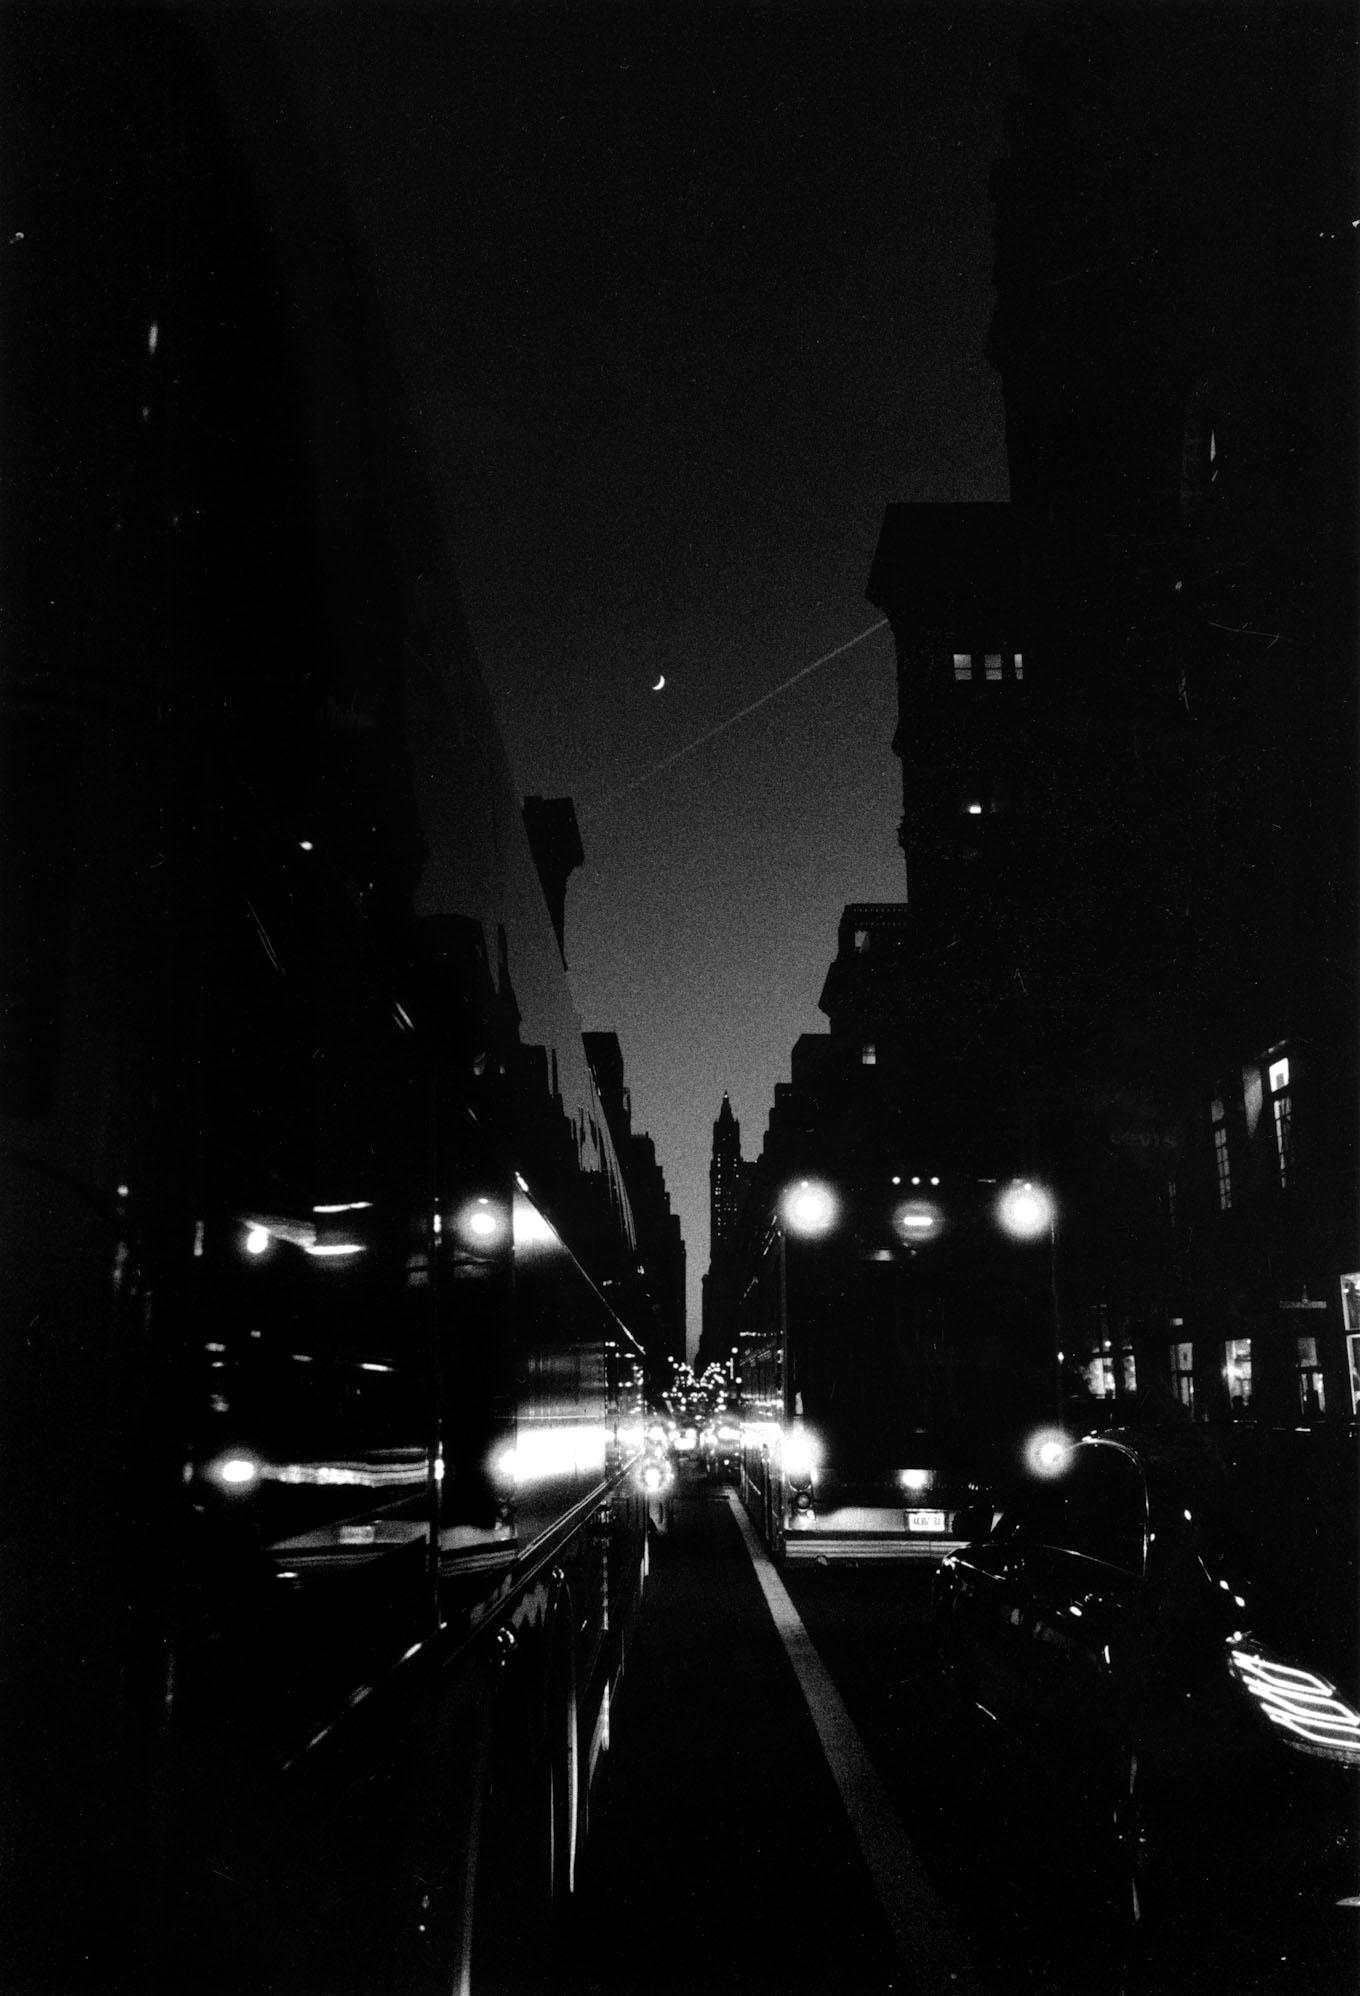 New-york-noir-cooper-ray-15